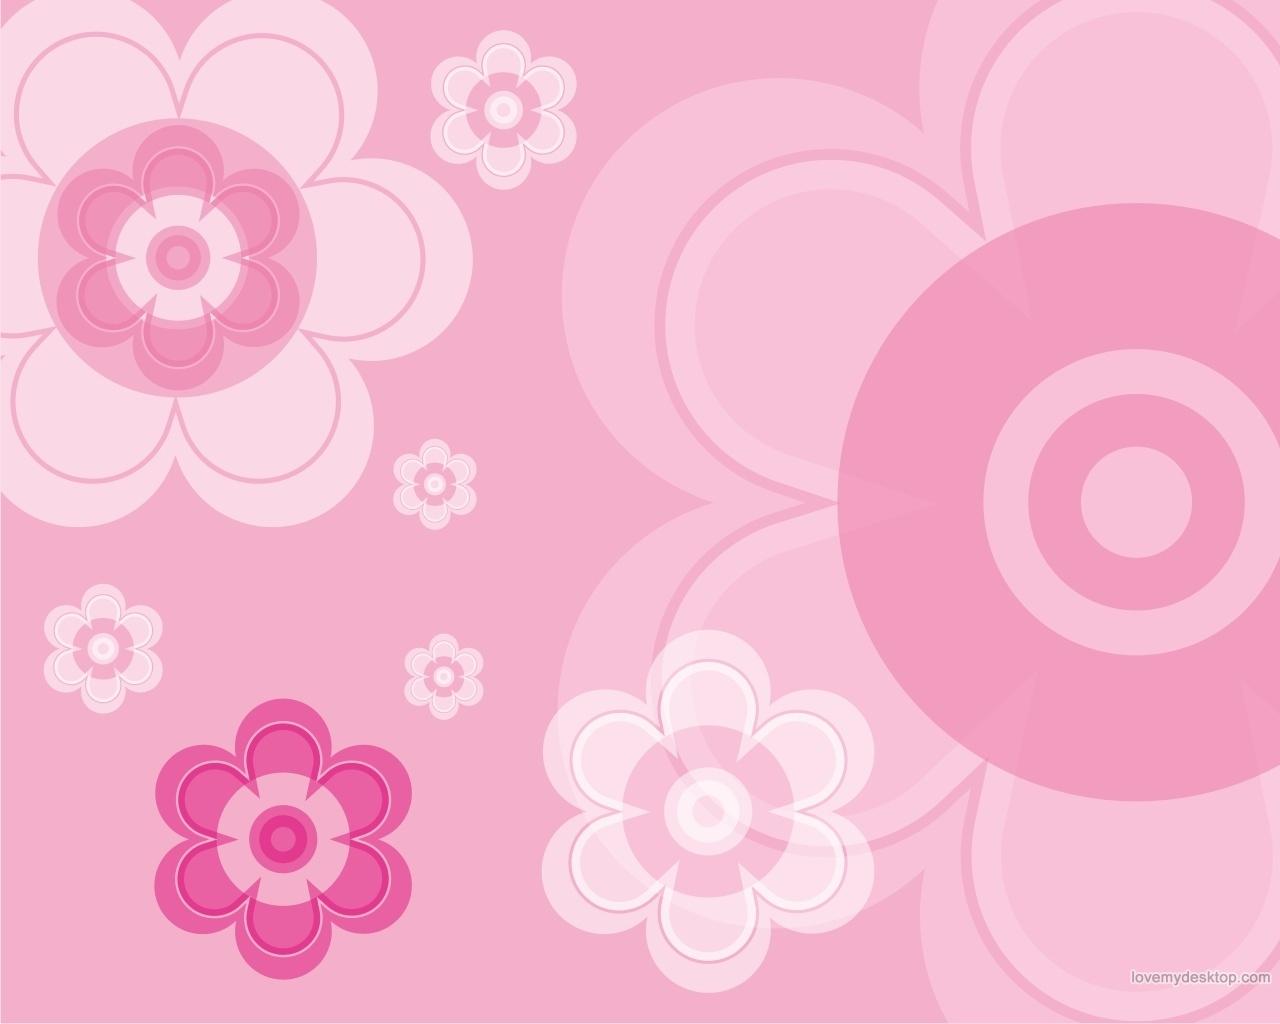 Nice Pink Daisy Photo 13193 - HDWPro